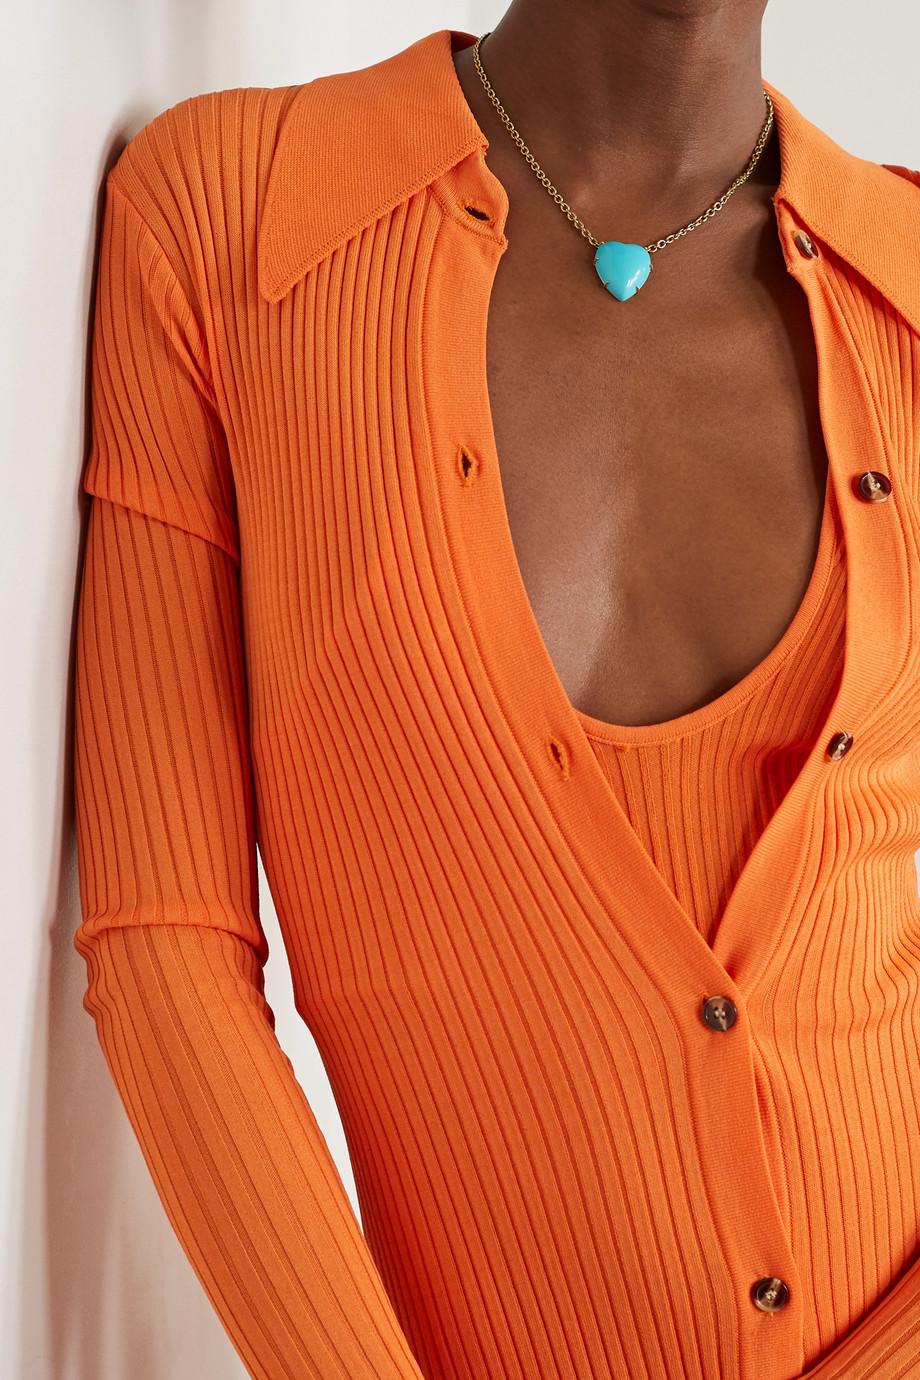 Irene Neuwirth Love 18-karat gold turquoise necklace